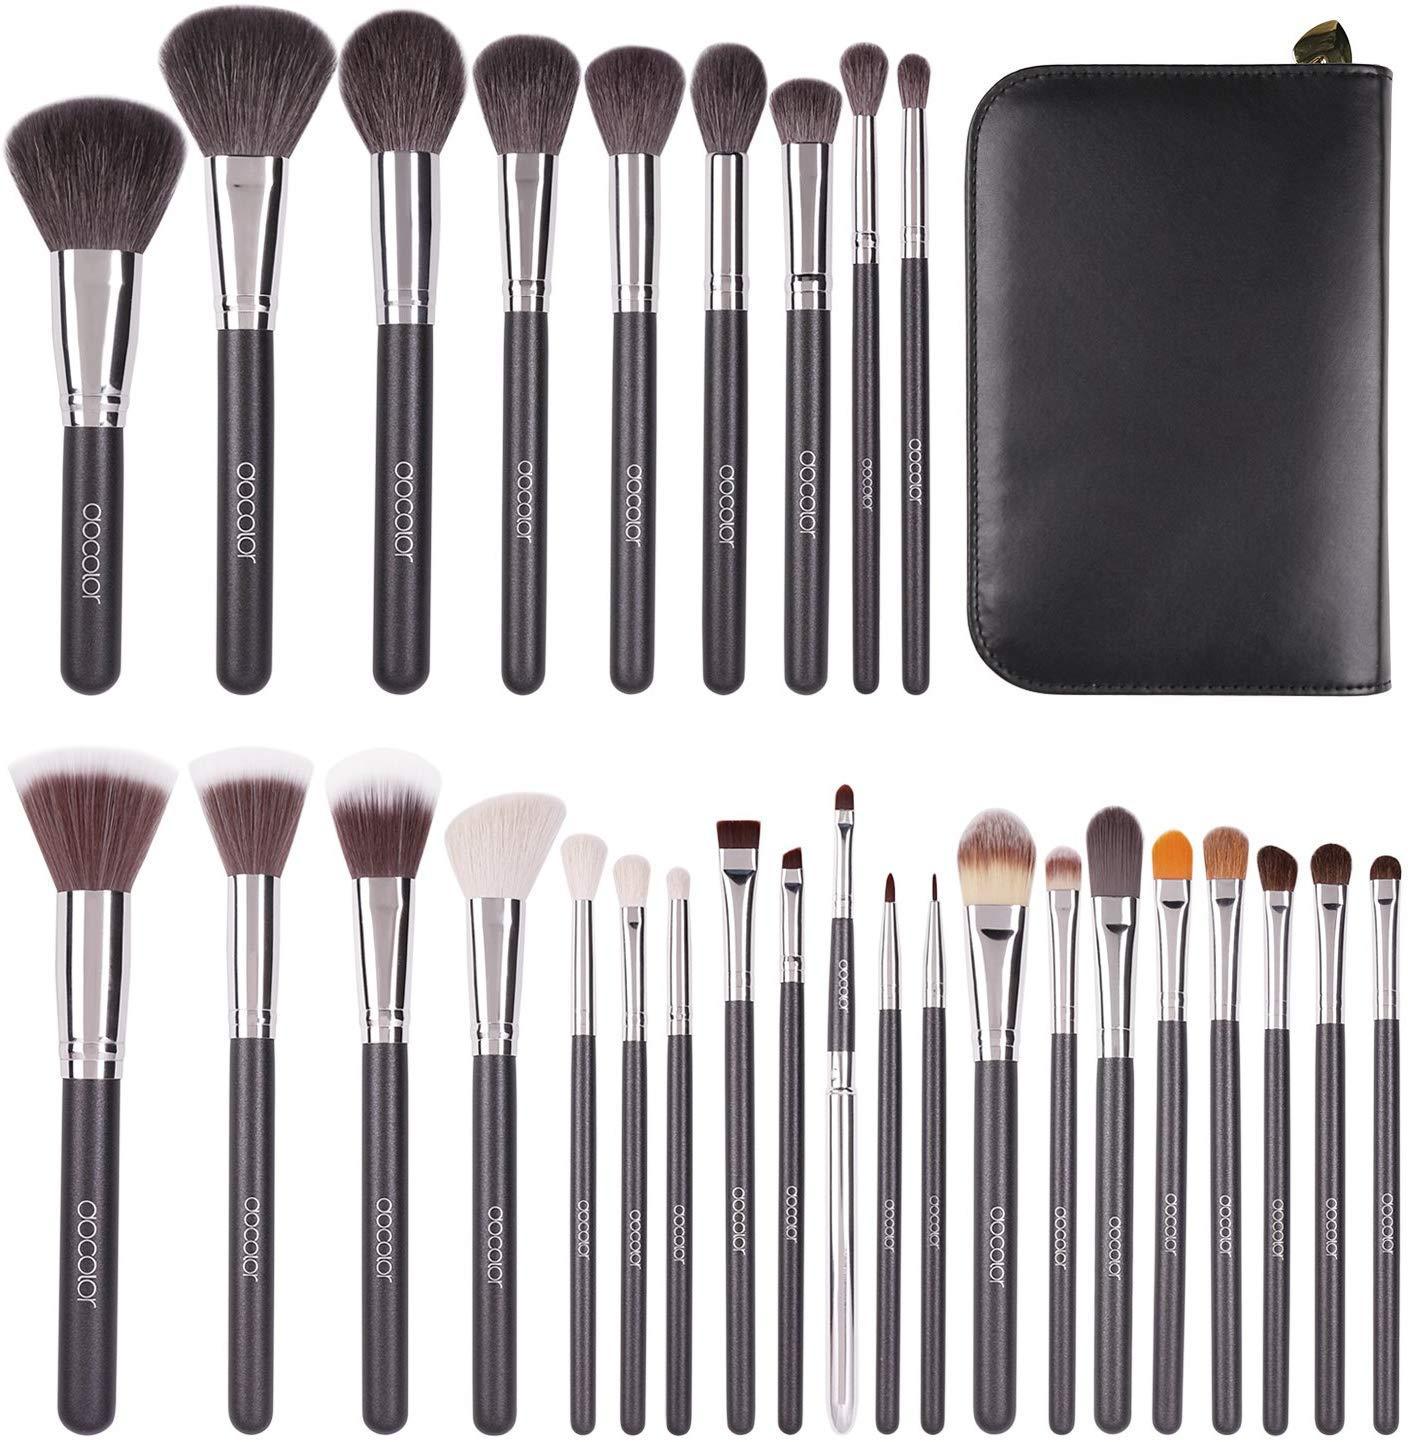 Professional Makeup Brush Set by Docolor